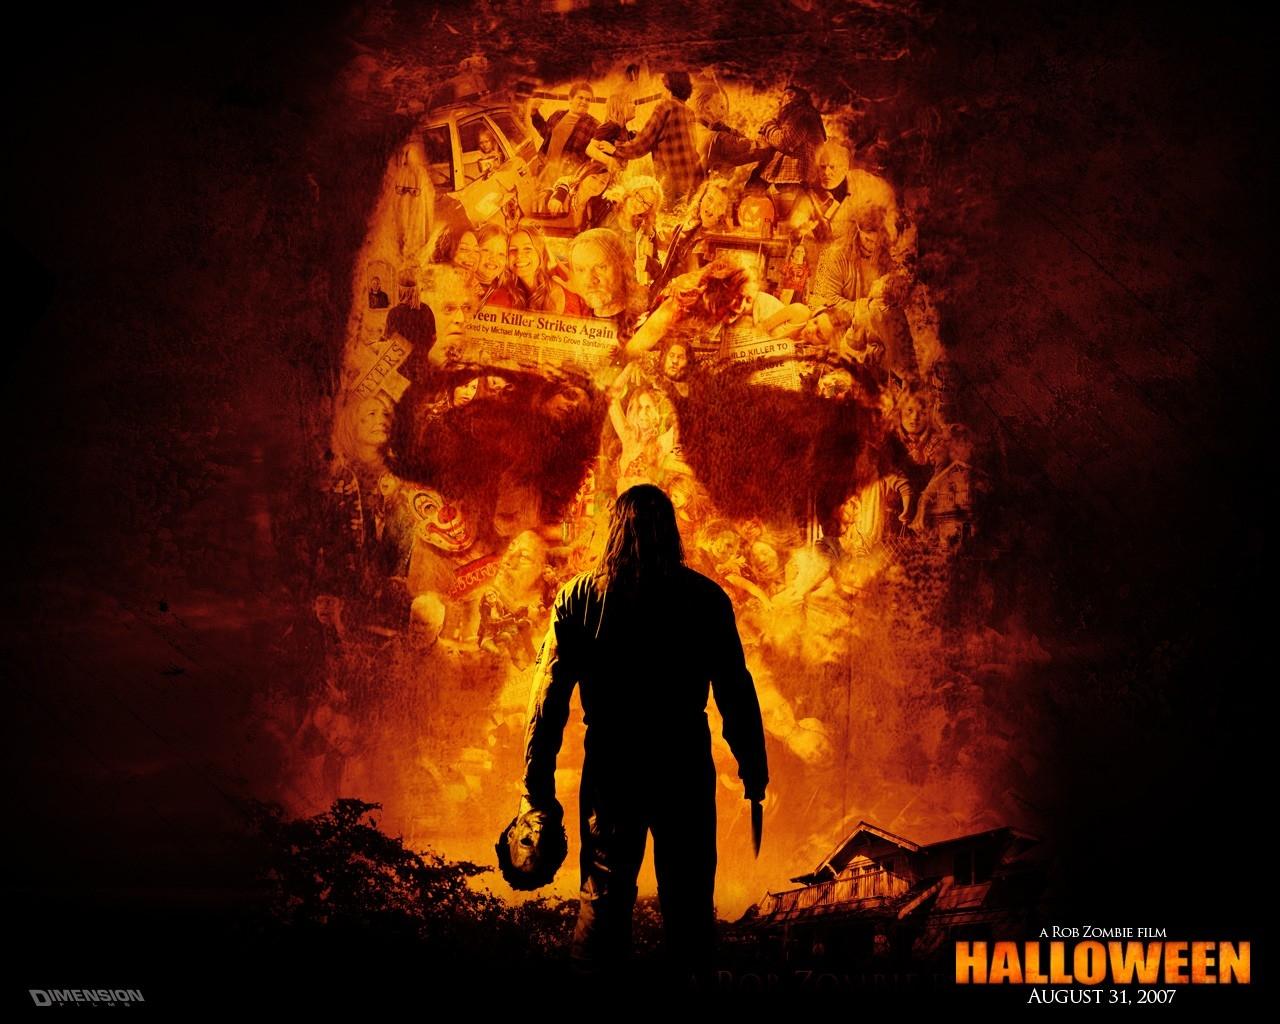 Wallpaper : halloween 2, Killer, maniac, death, fear 1280x1024 ...